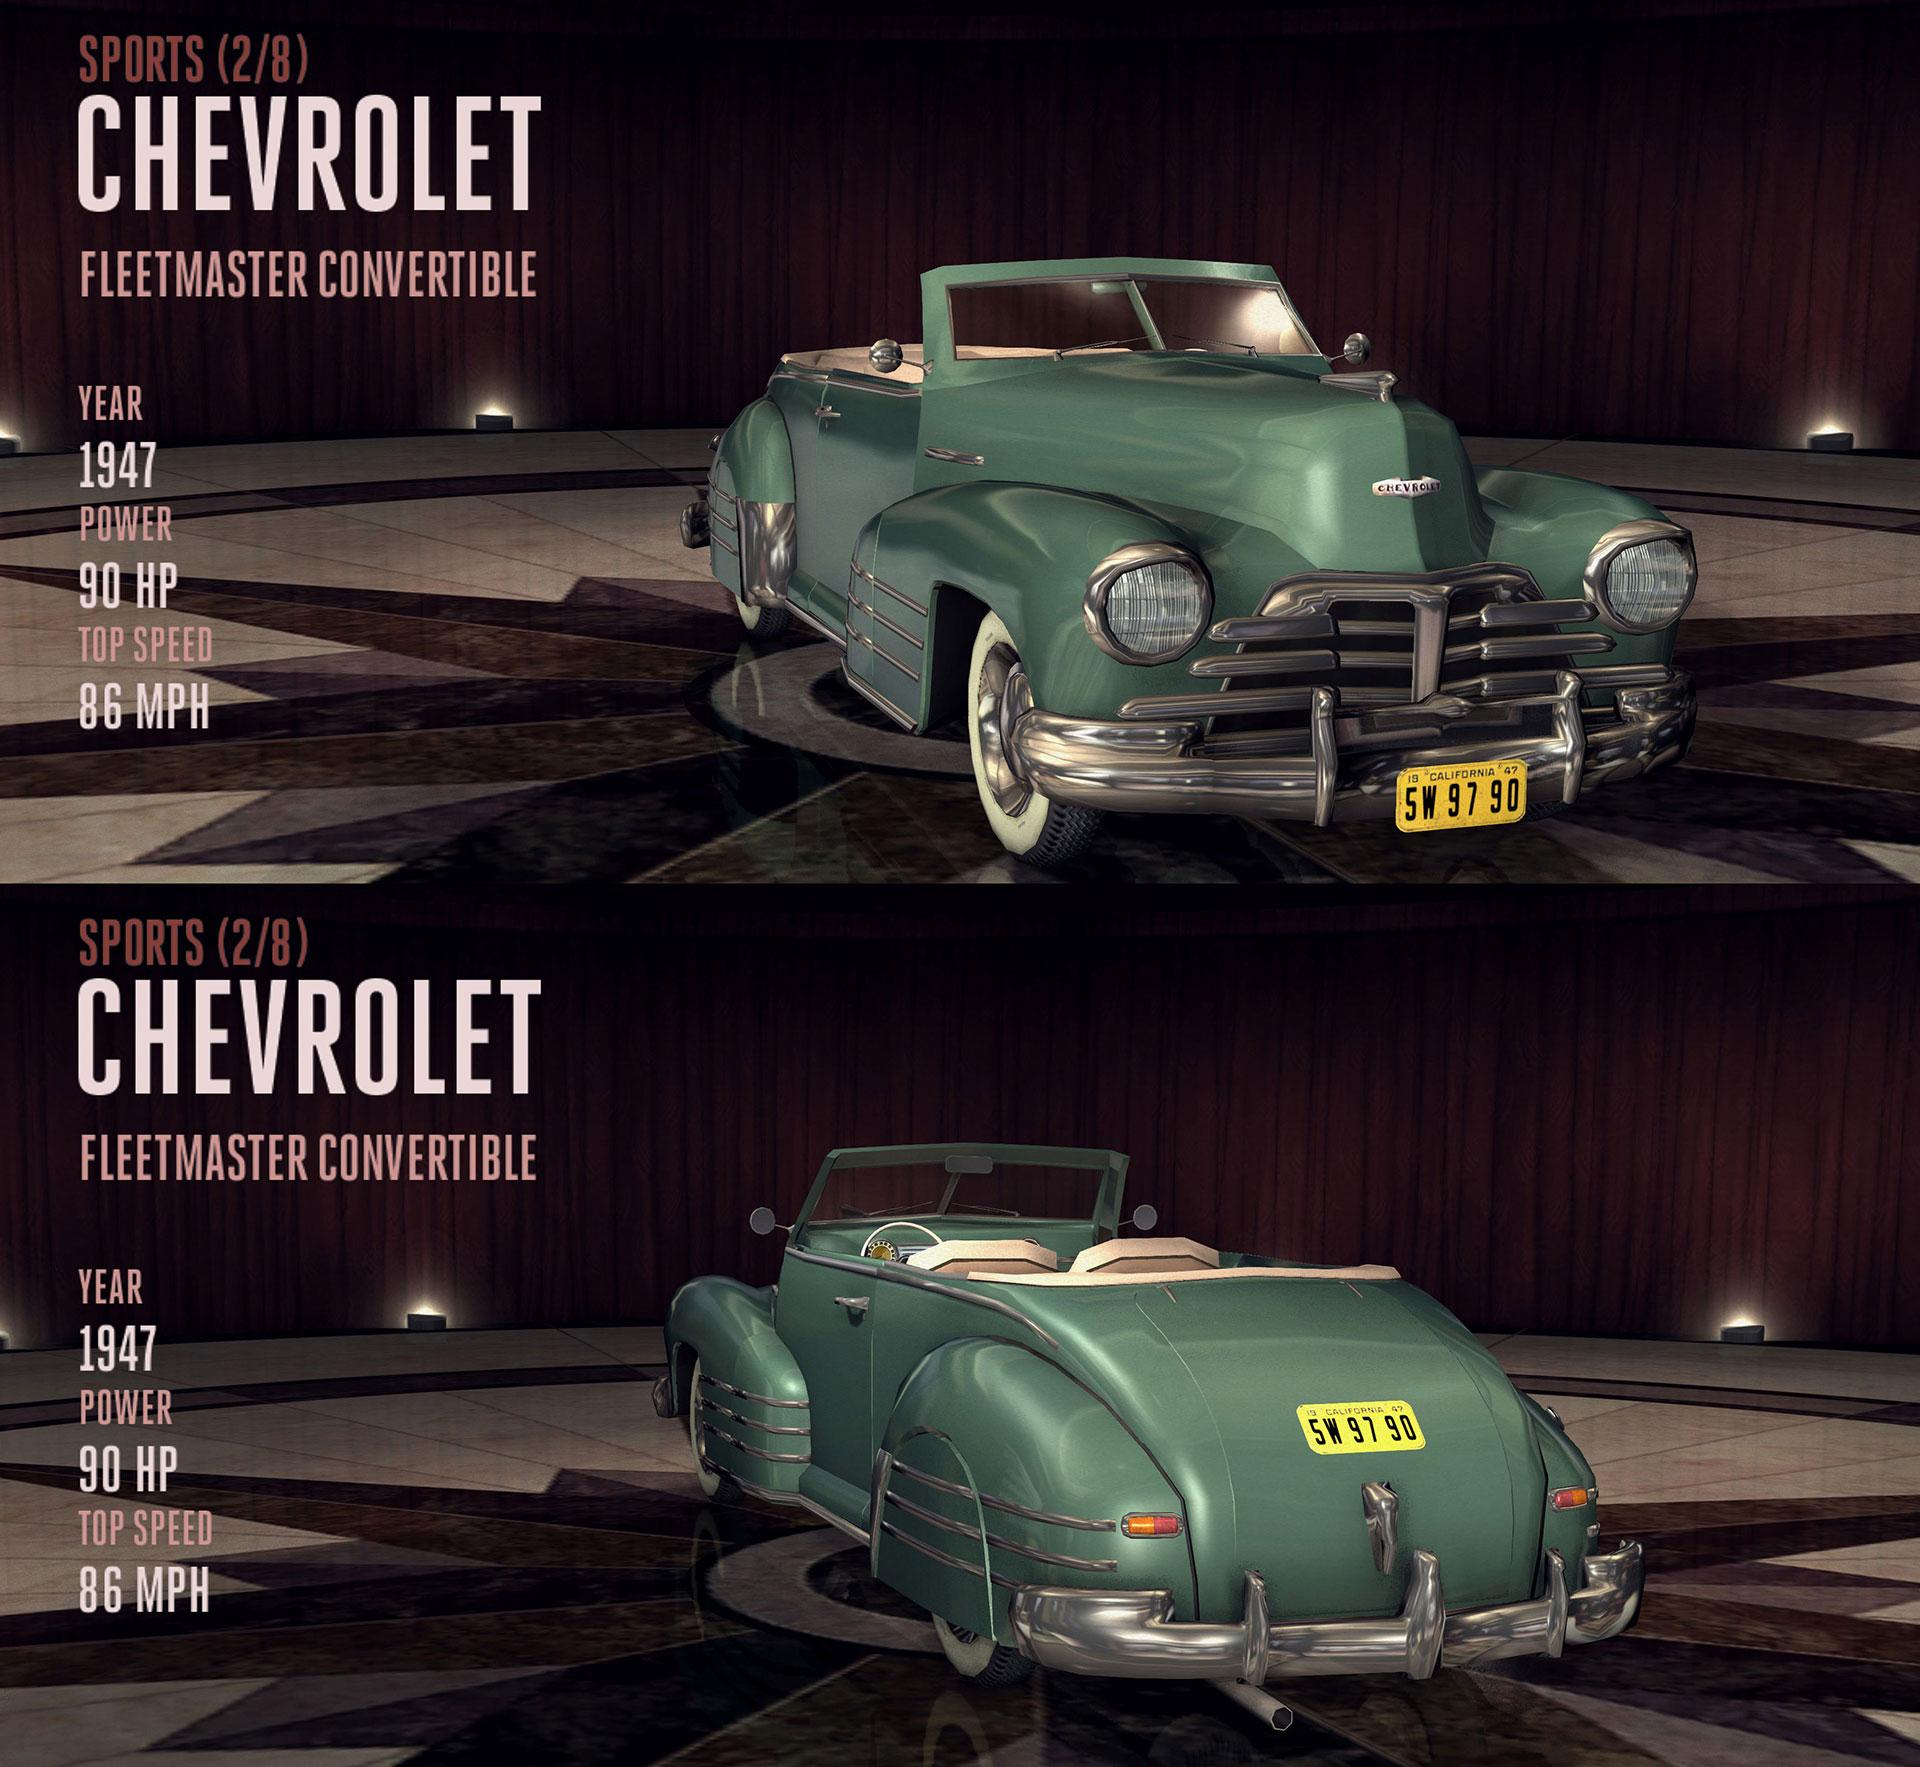 chevrolet fleetmaster convertible | l.a. noire wiki | fandom